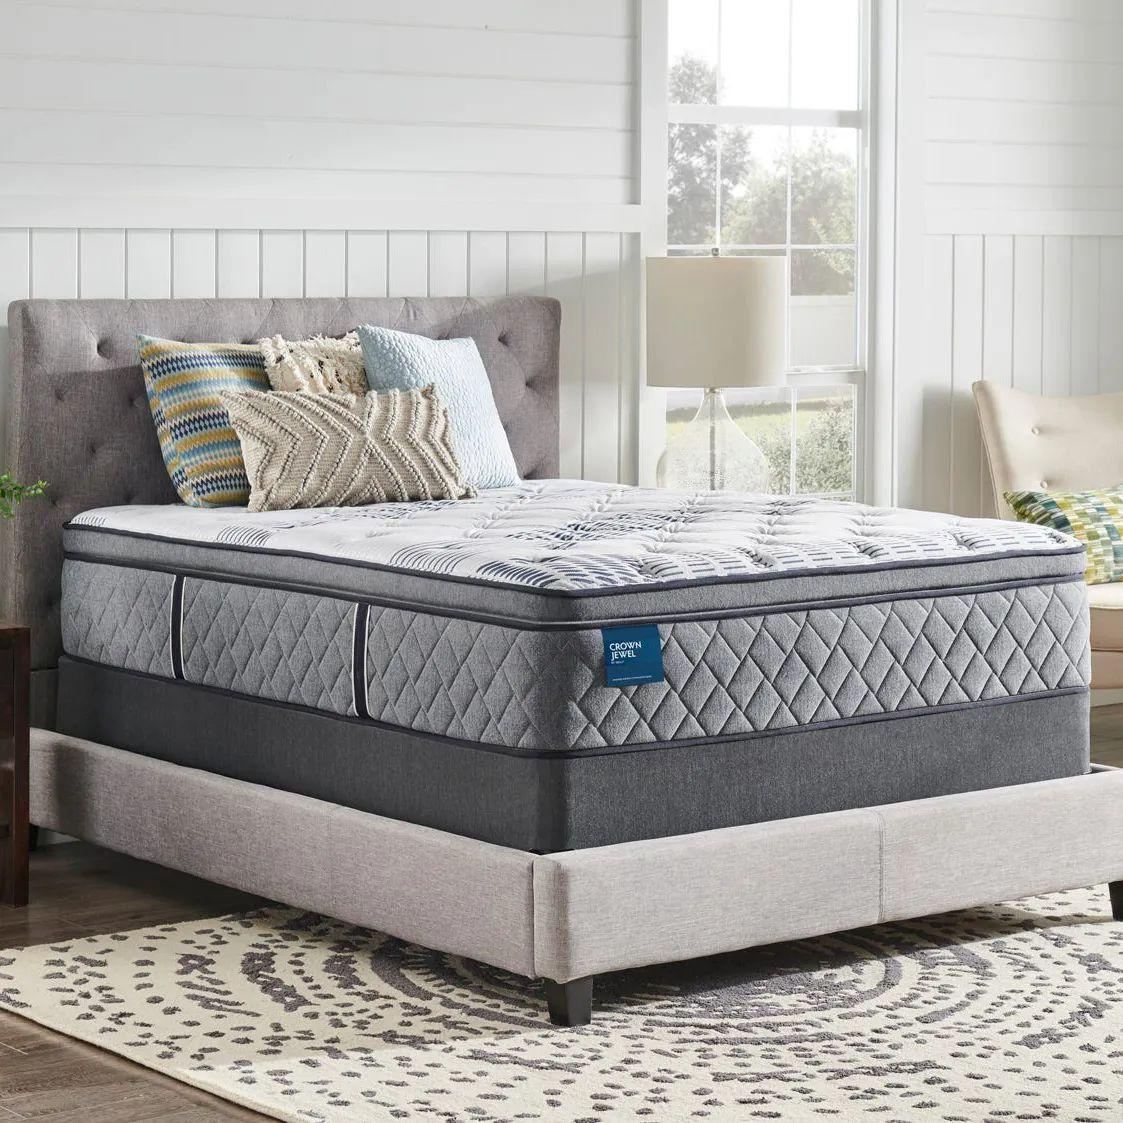 queen sealy crown jewel performance roseway plush pillow top 15 inch mattress